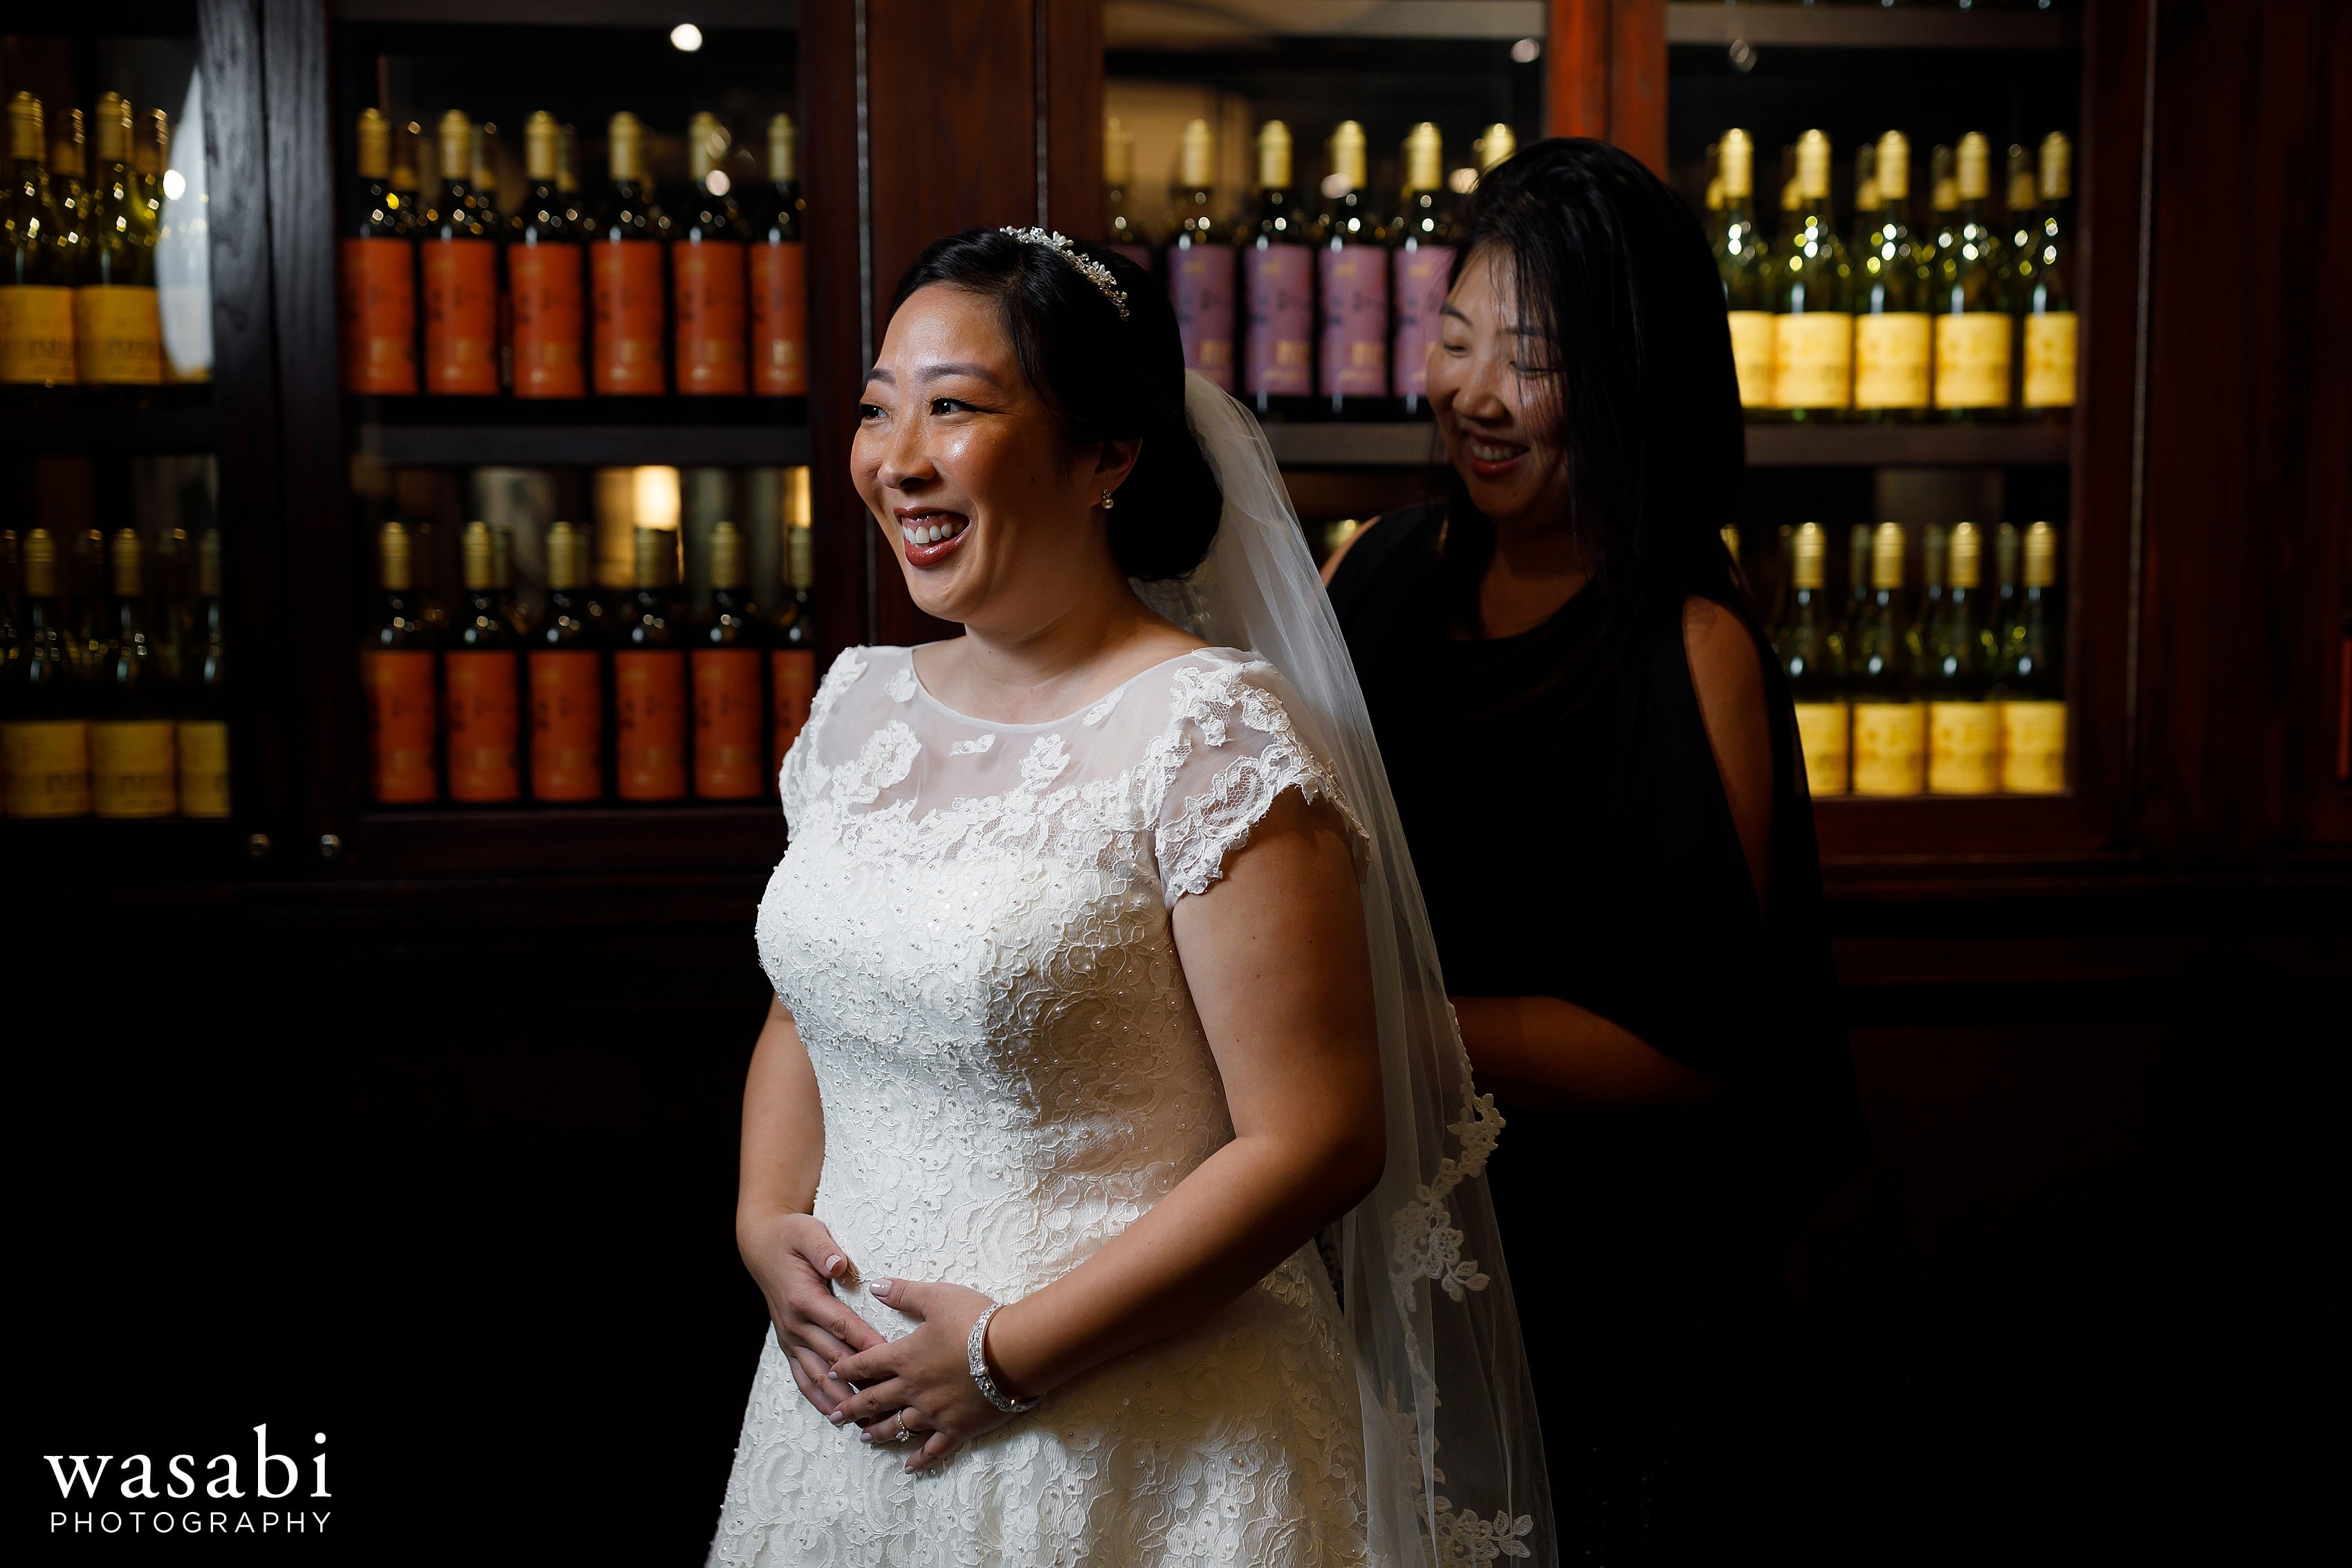 sister helps bride into wedding dress